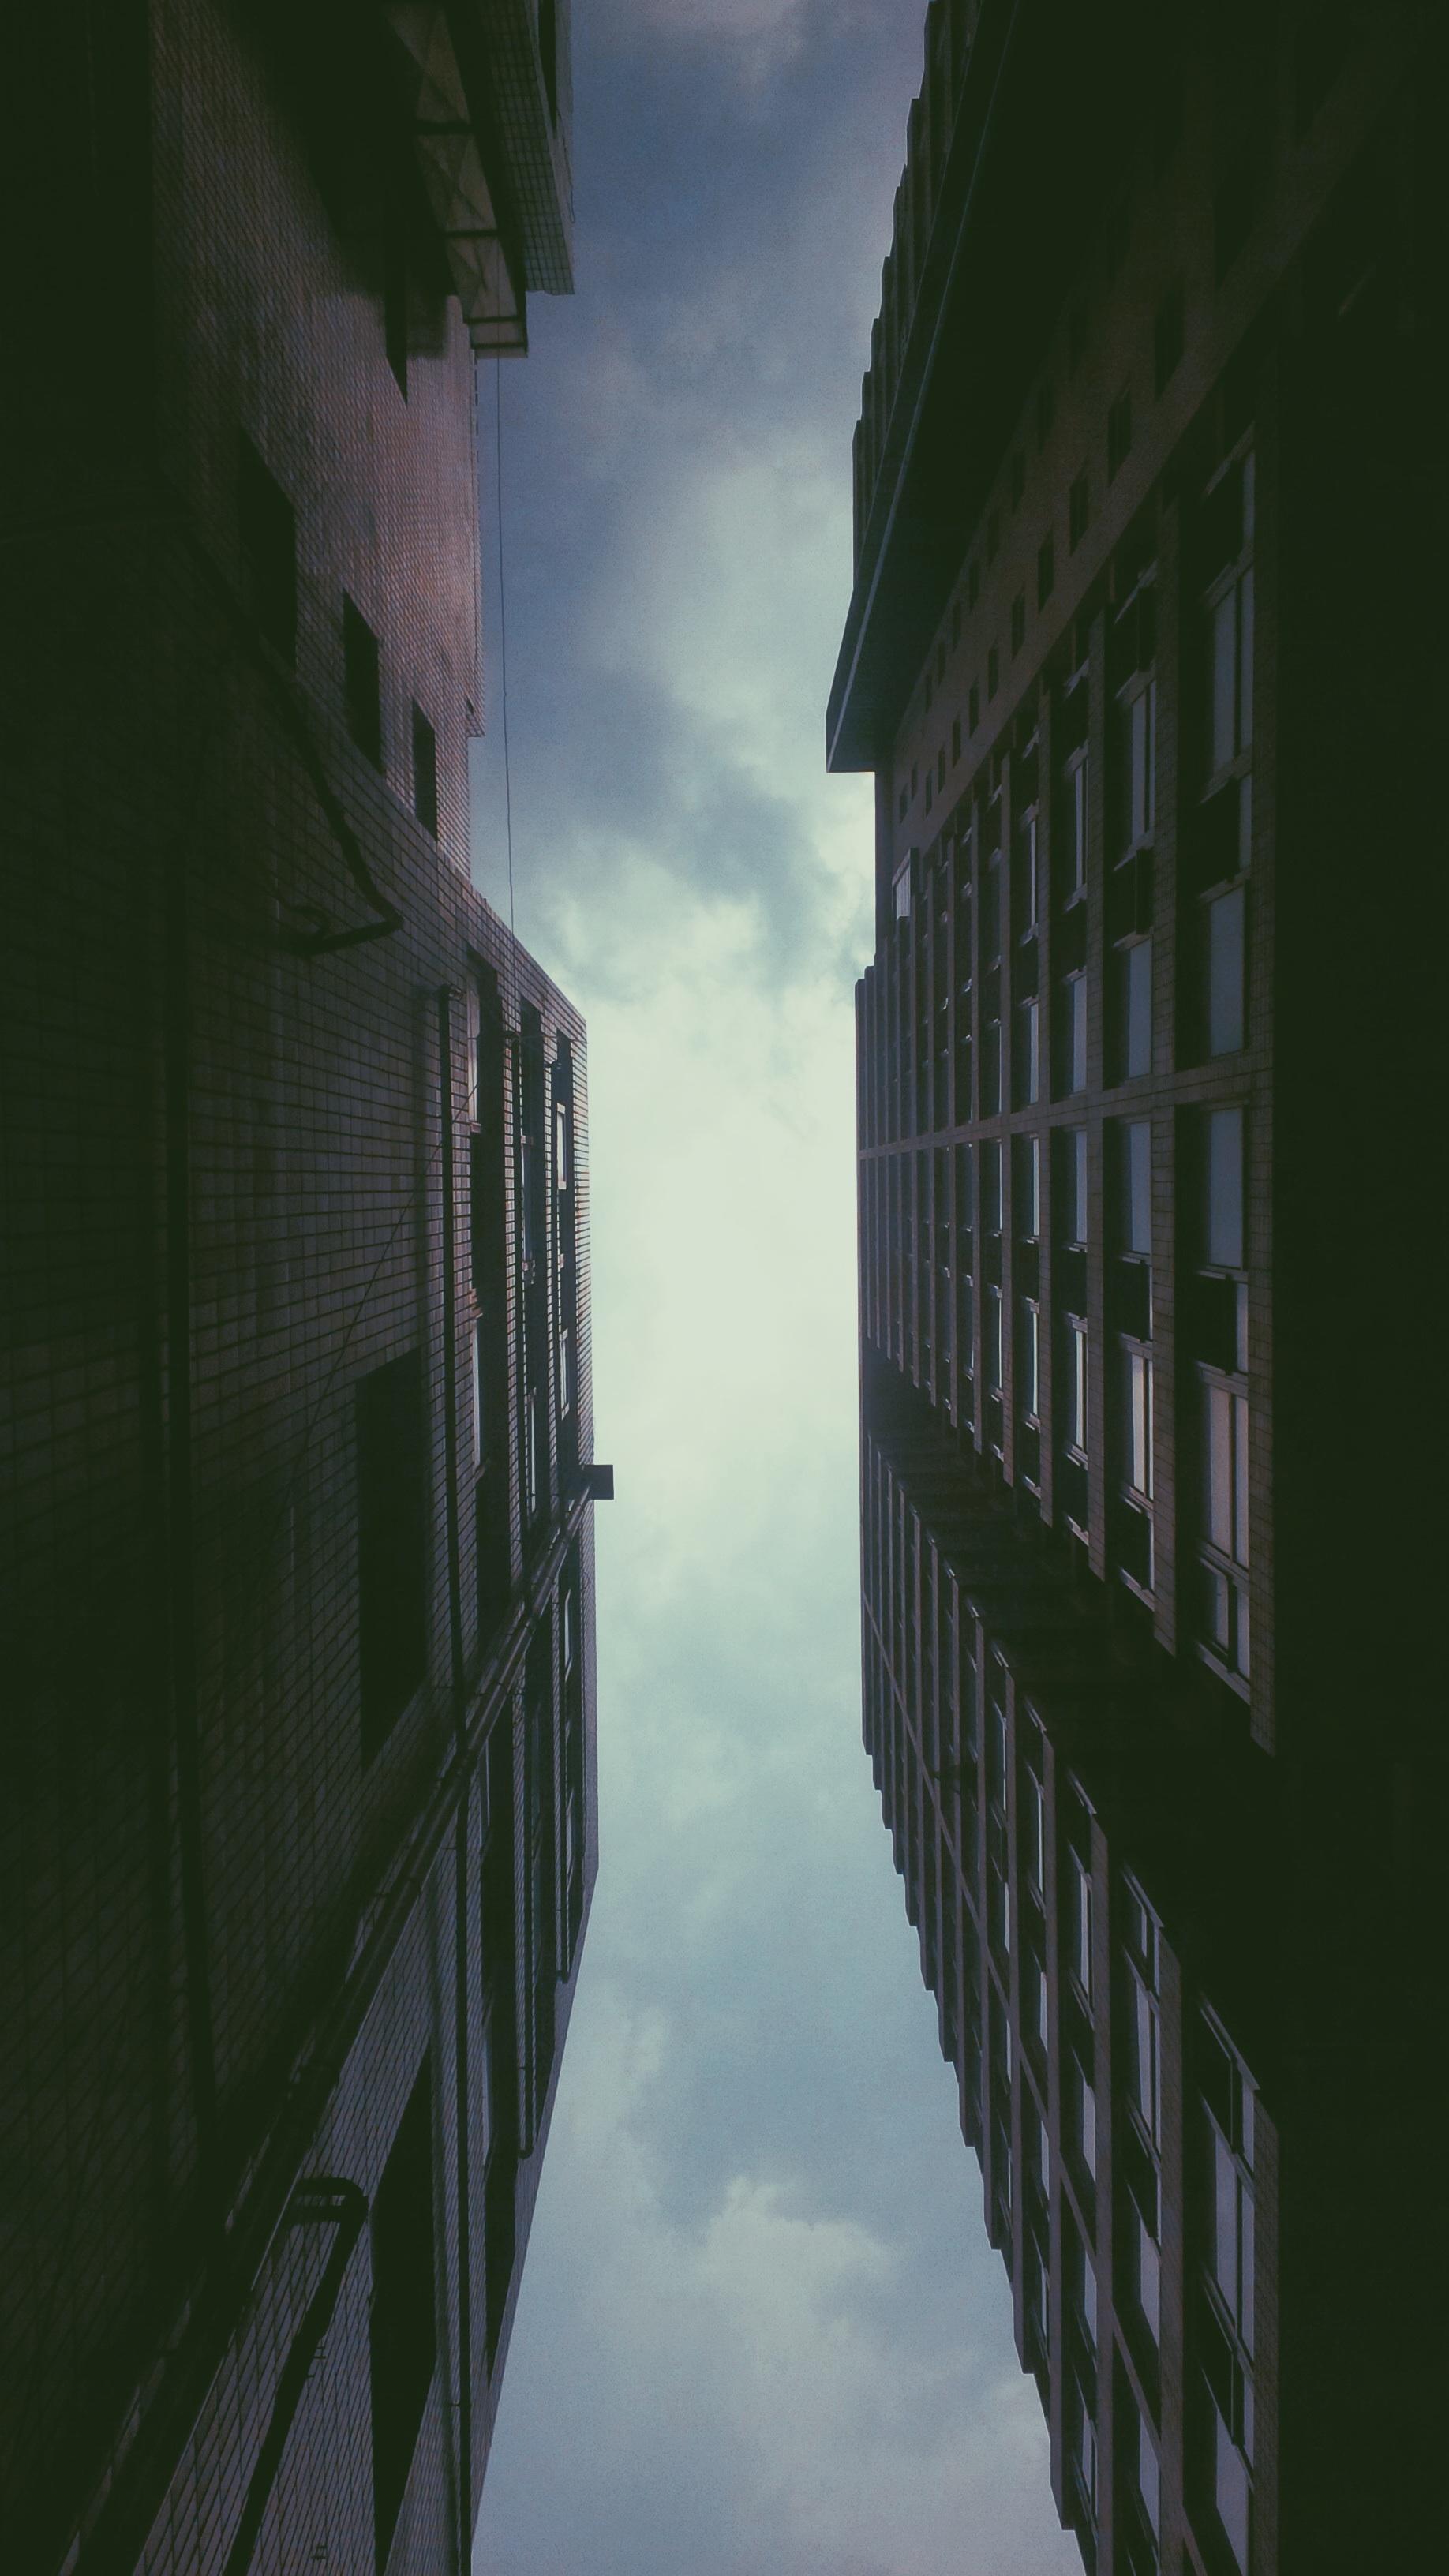 Sky High, Skyscraper, Urban, High, Height, HQ Photo